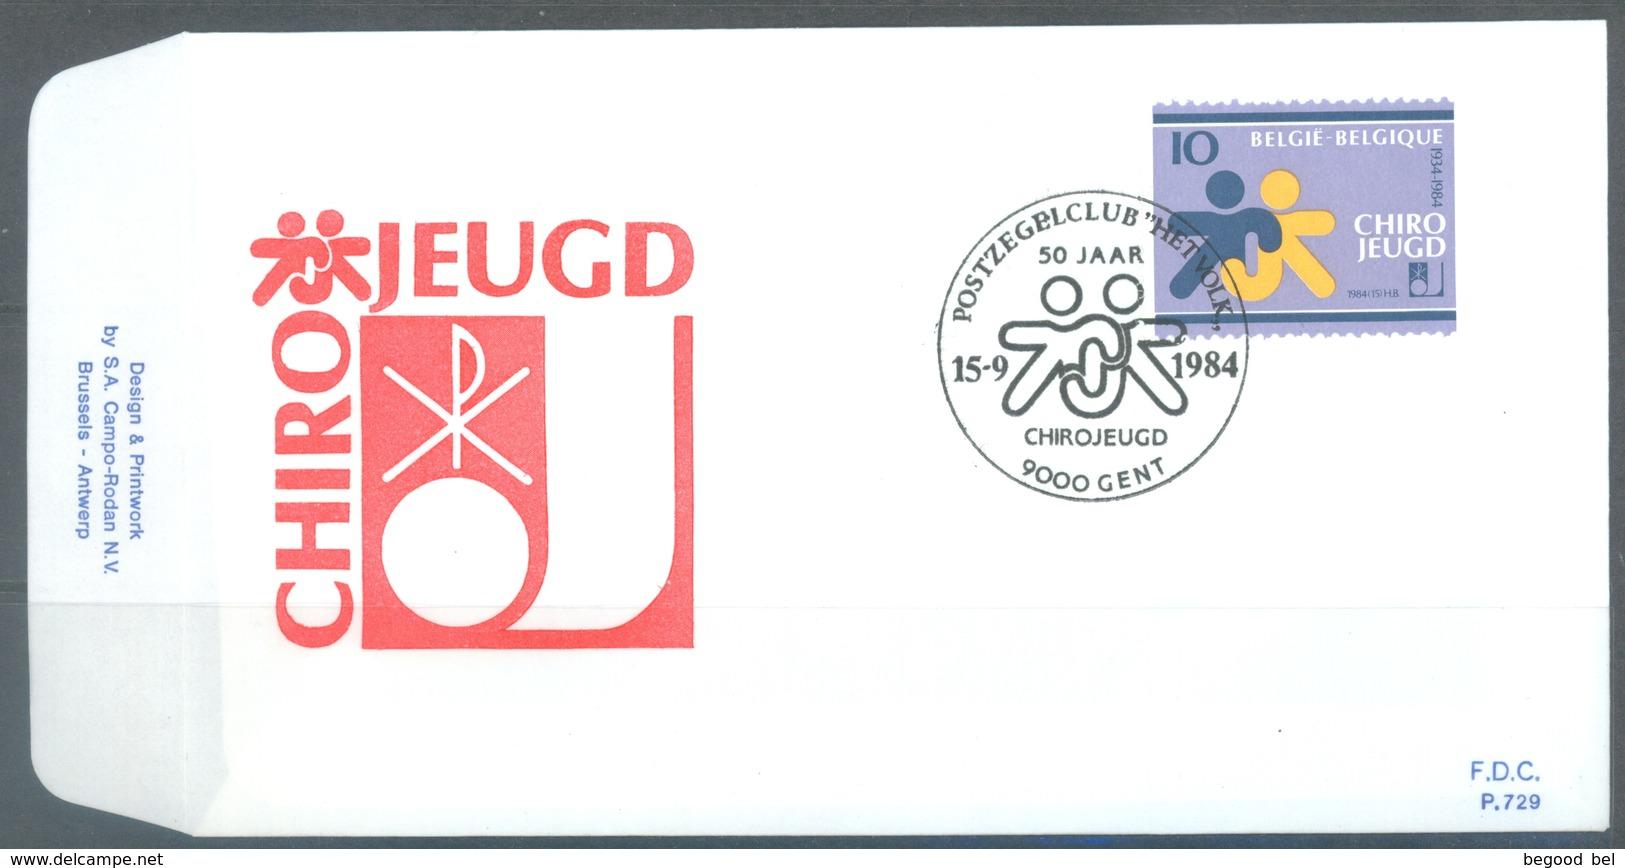 BELGIUM - 15.9.1984 - FDC - CHIRO JEUGD  RODAN 729 GENT - COB 2145 -  Lot 19585 - FDC